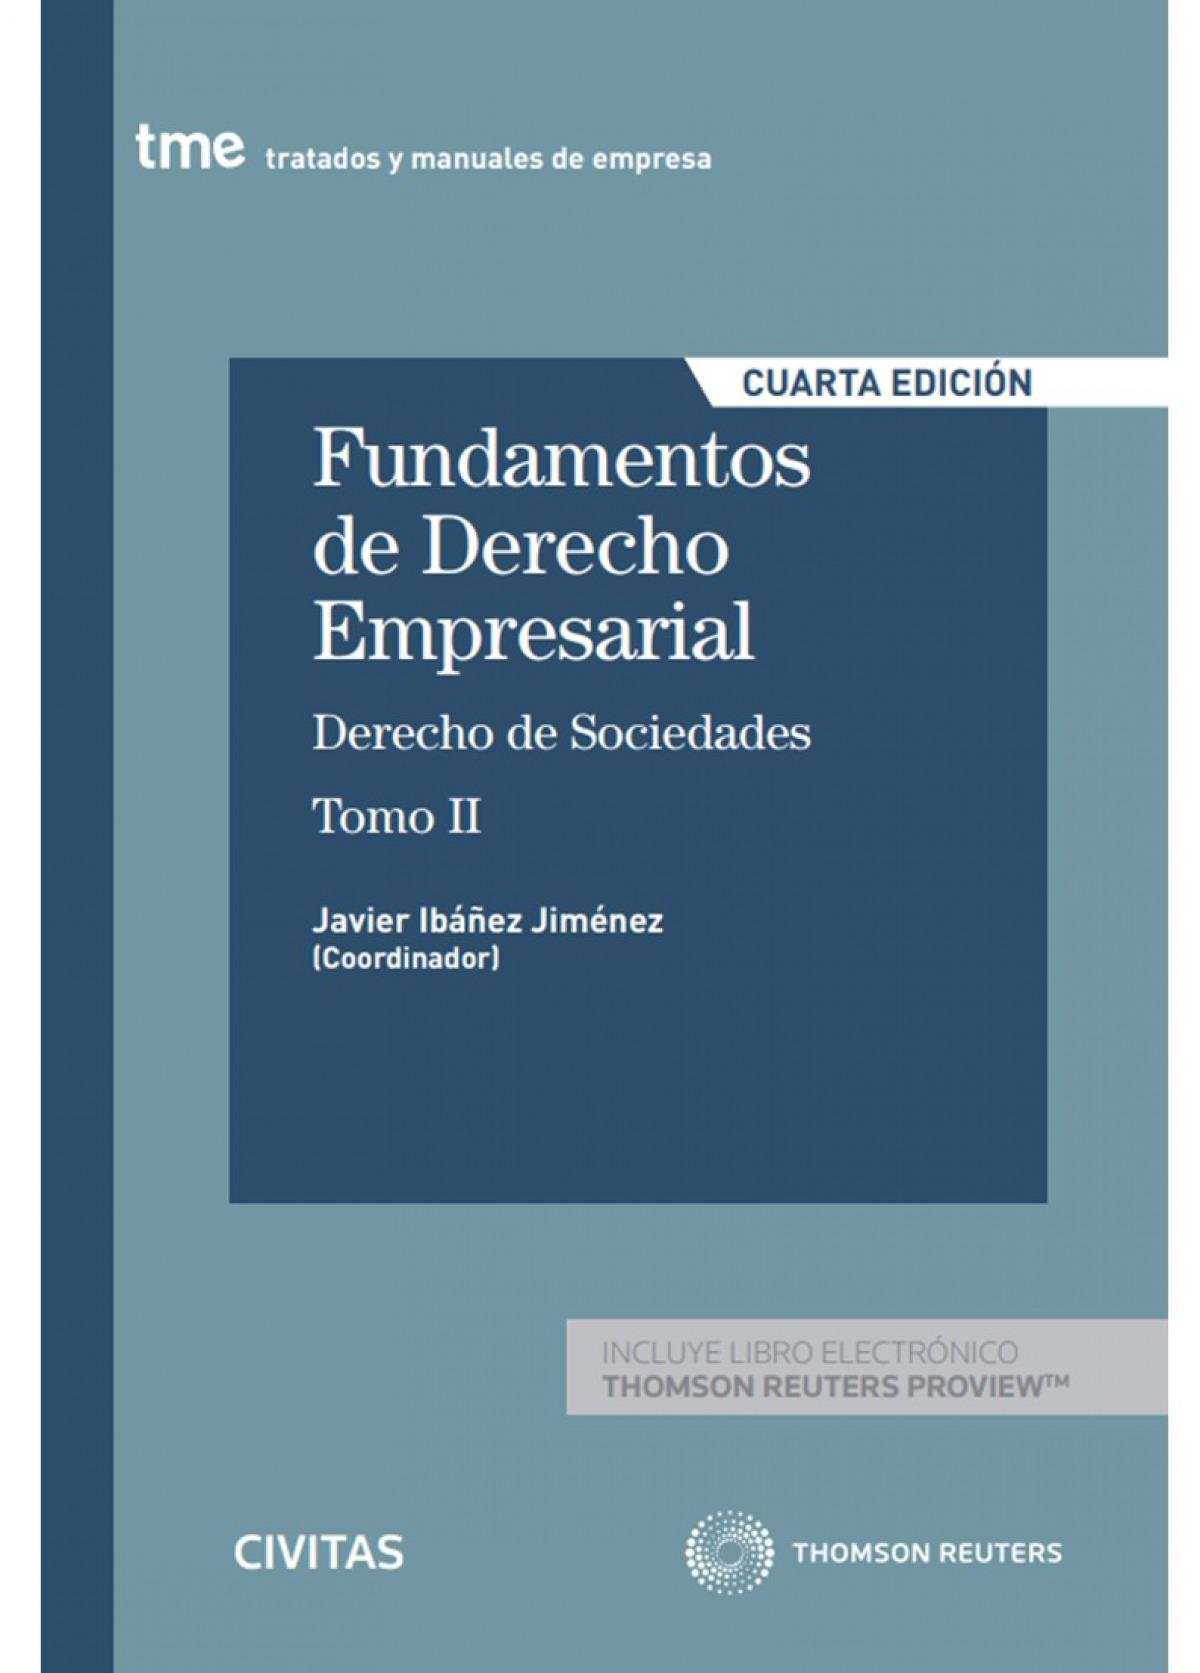 Fundamentos de Derecho Empresarial (II) (Papel + e-book) 9788413089805